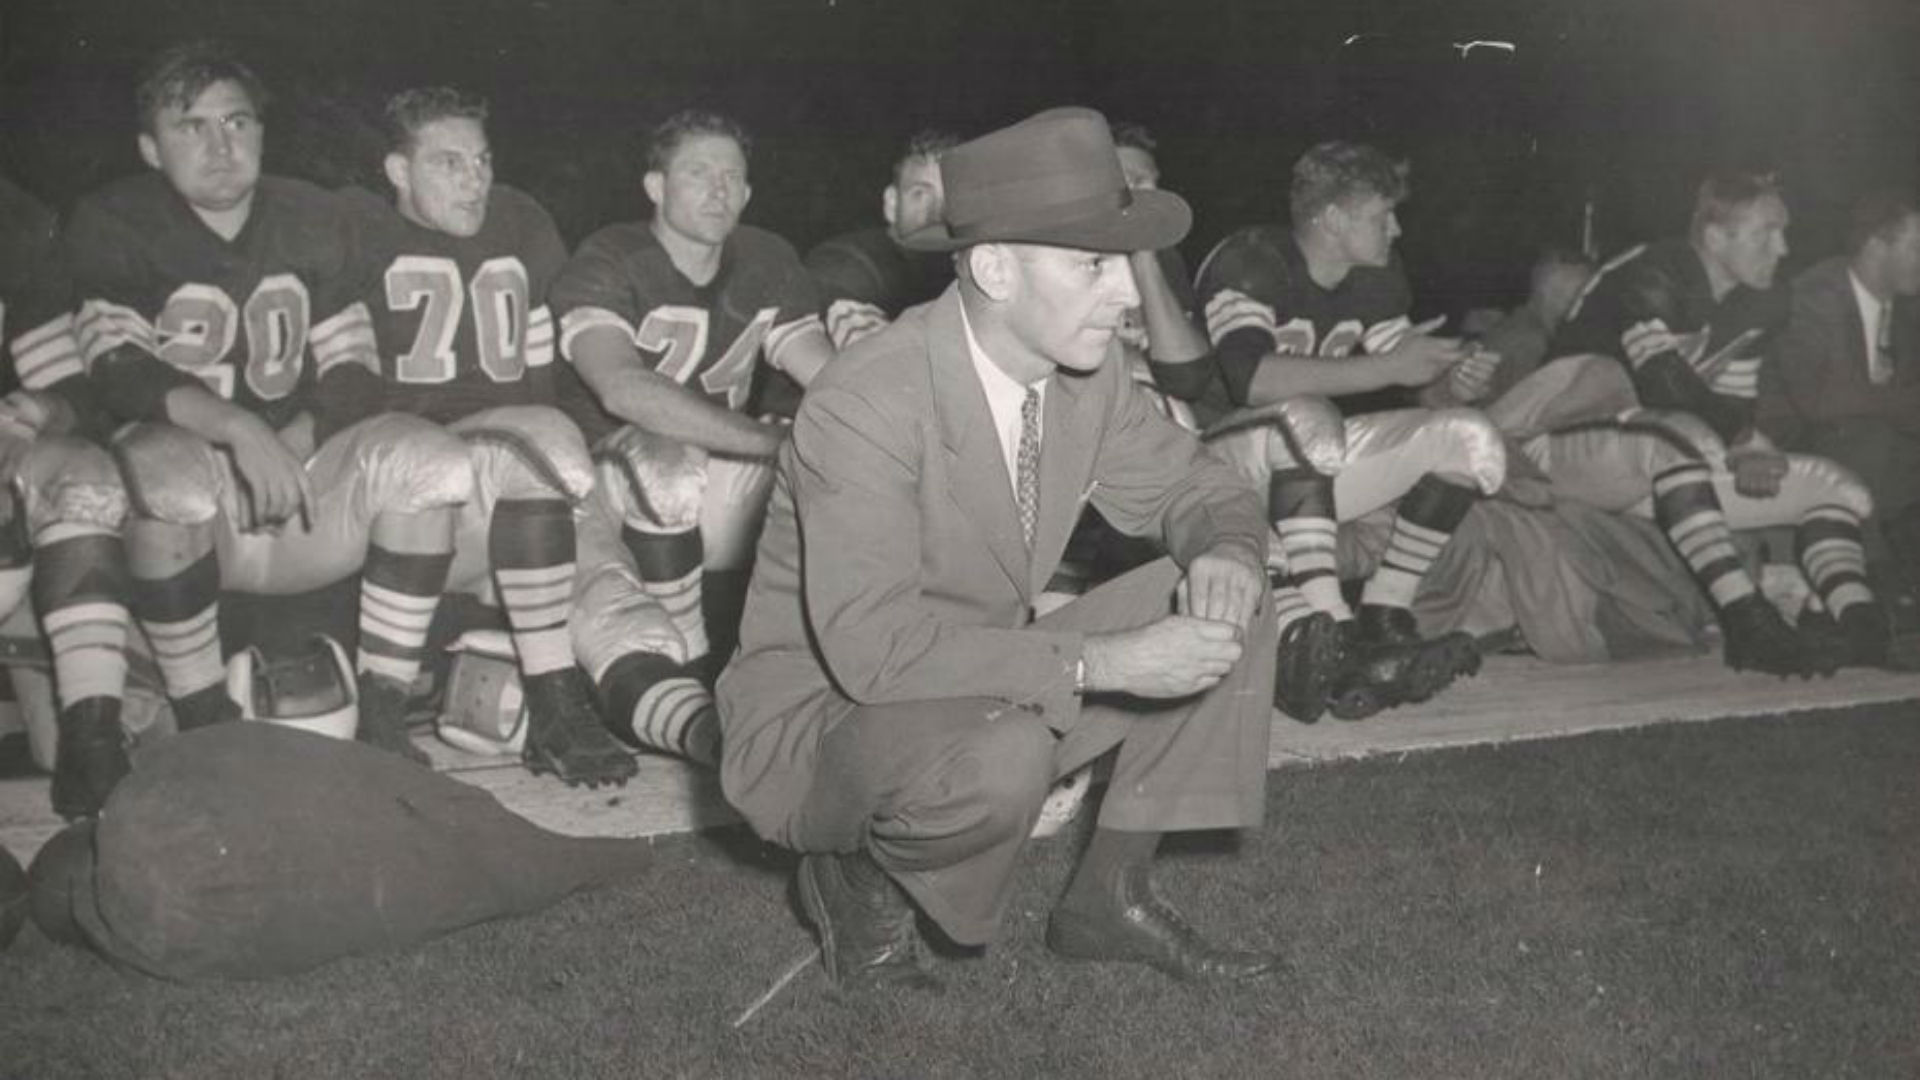 1946-cleveland-browns-uniforms-041415-ft